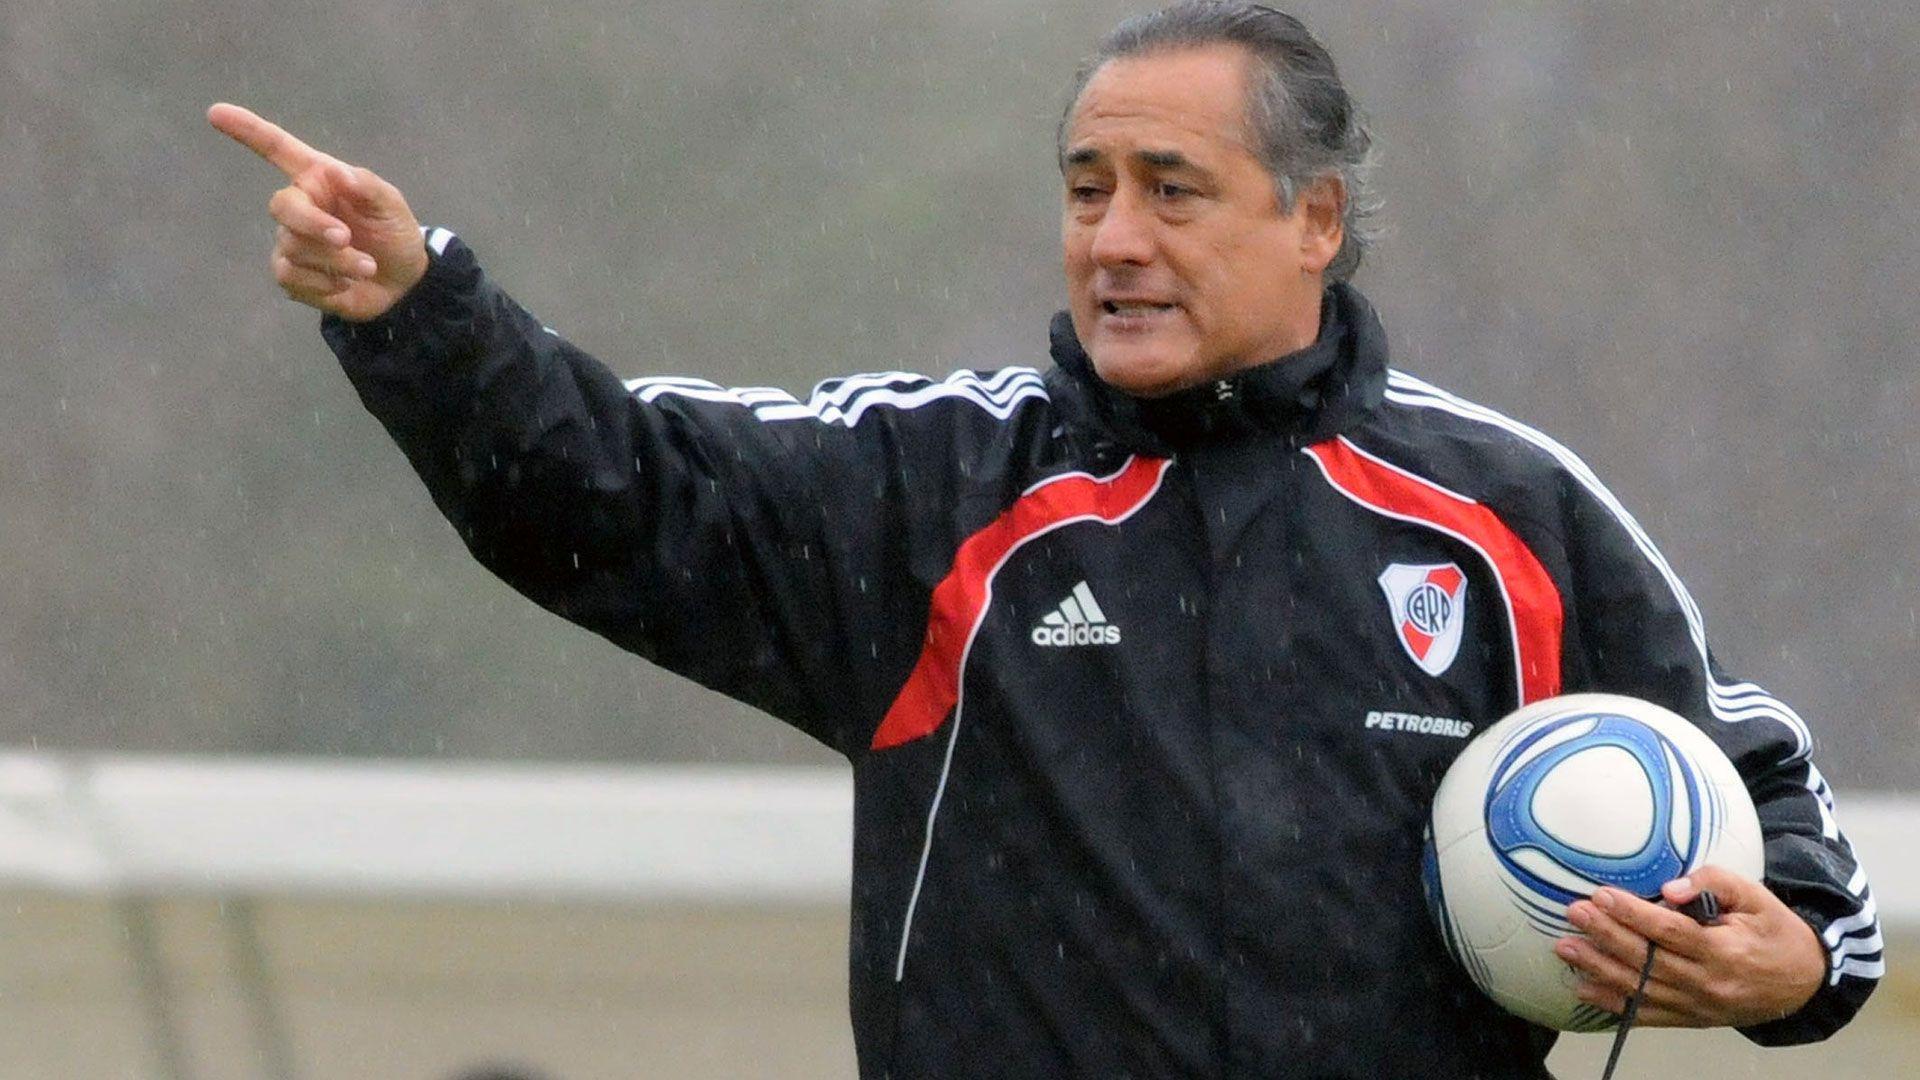 Juan José López tecnico de river